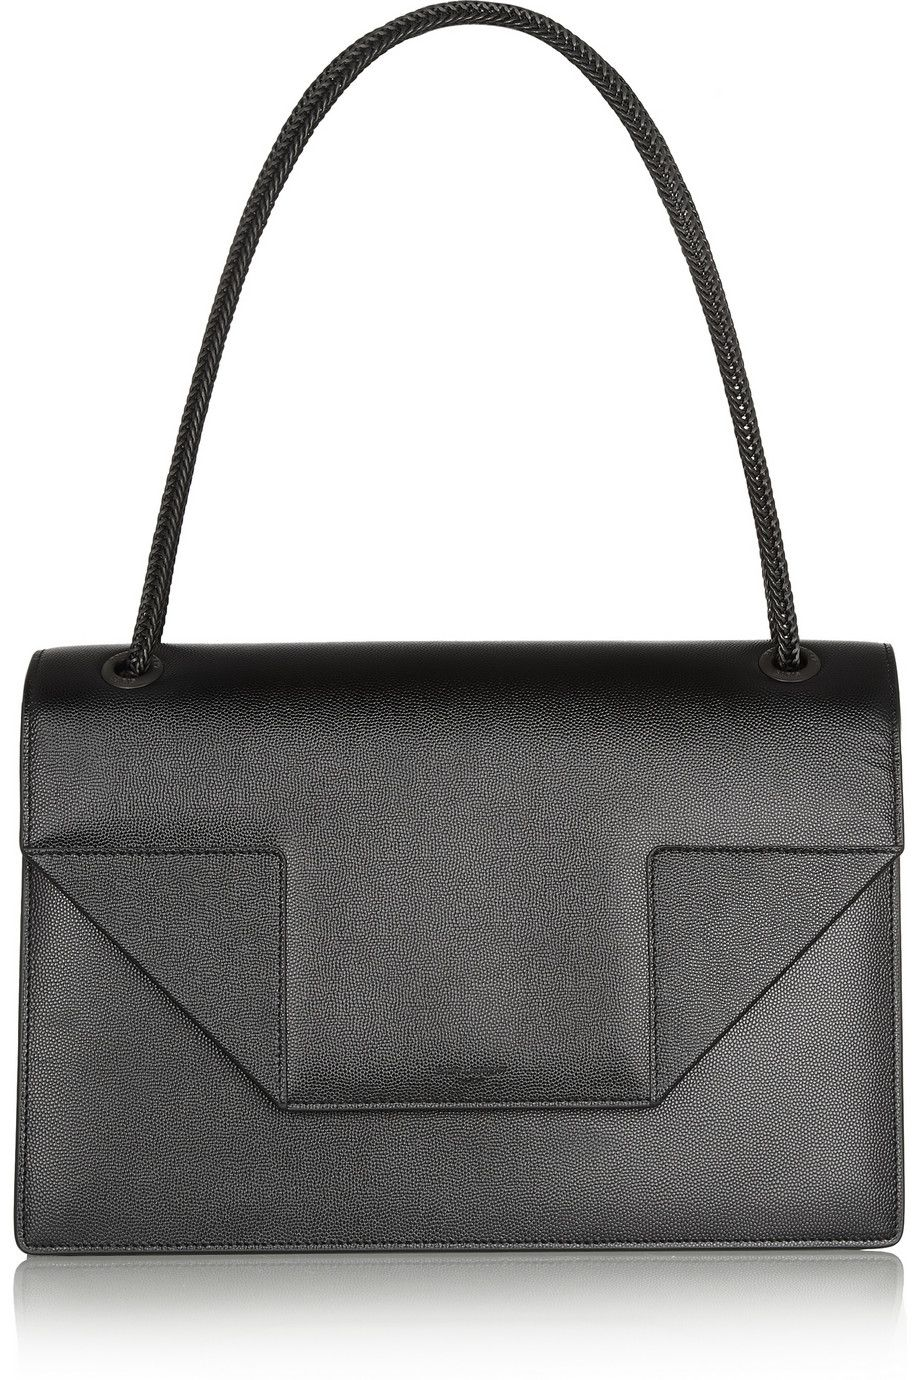 c495bfb8e8d Saint Laurent   Betty Jumbo textured-leather shoulder bag   NET-A-PORTER.COM